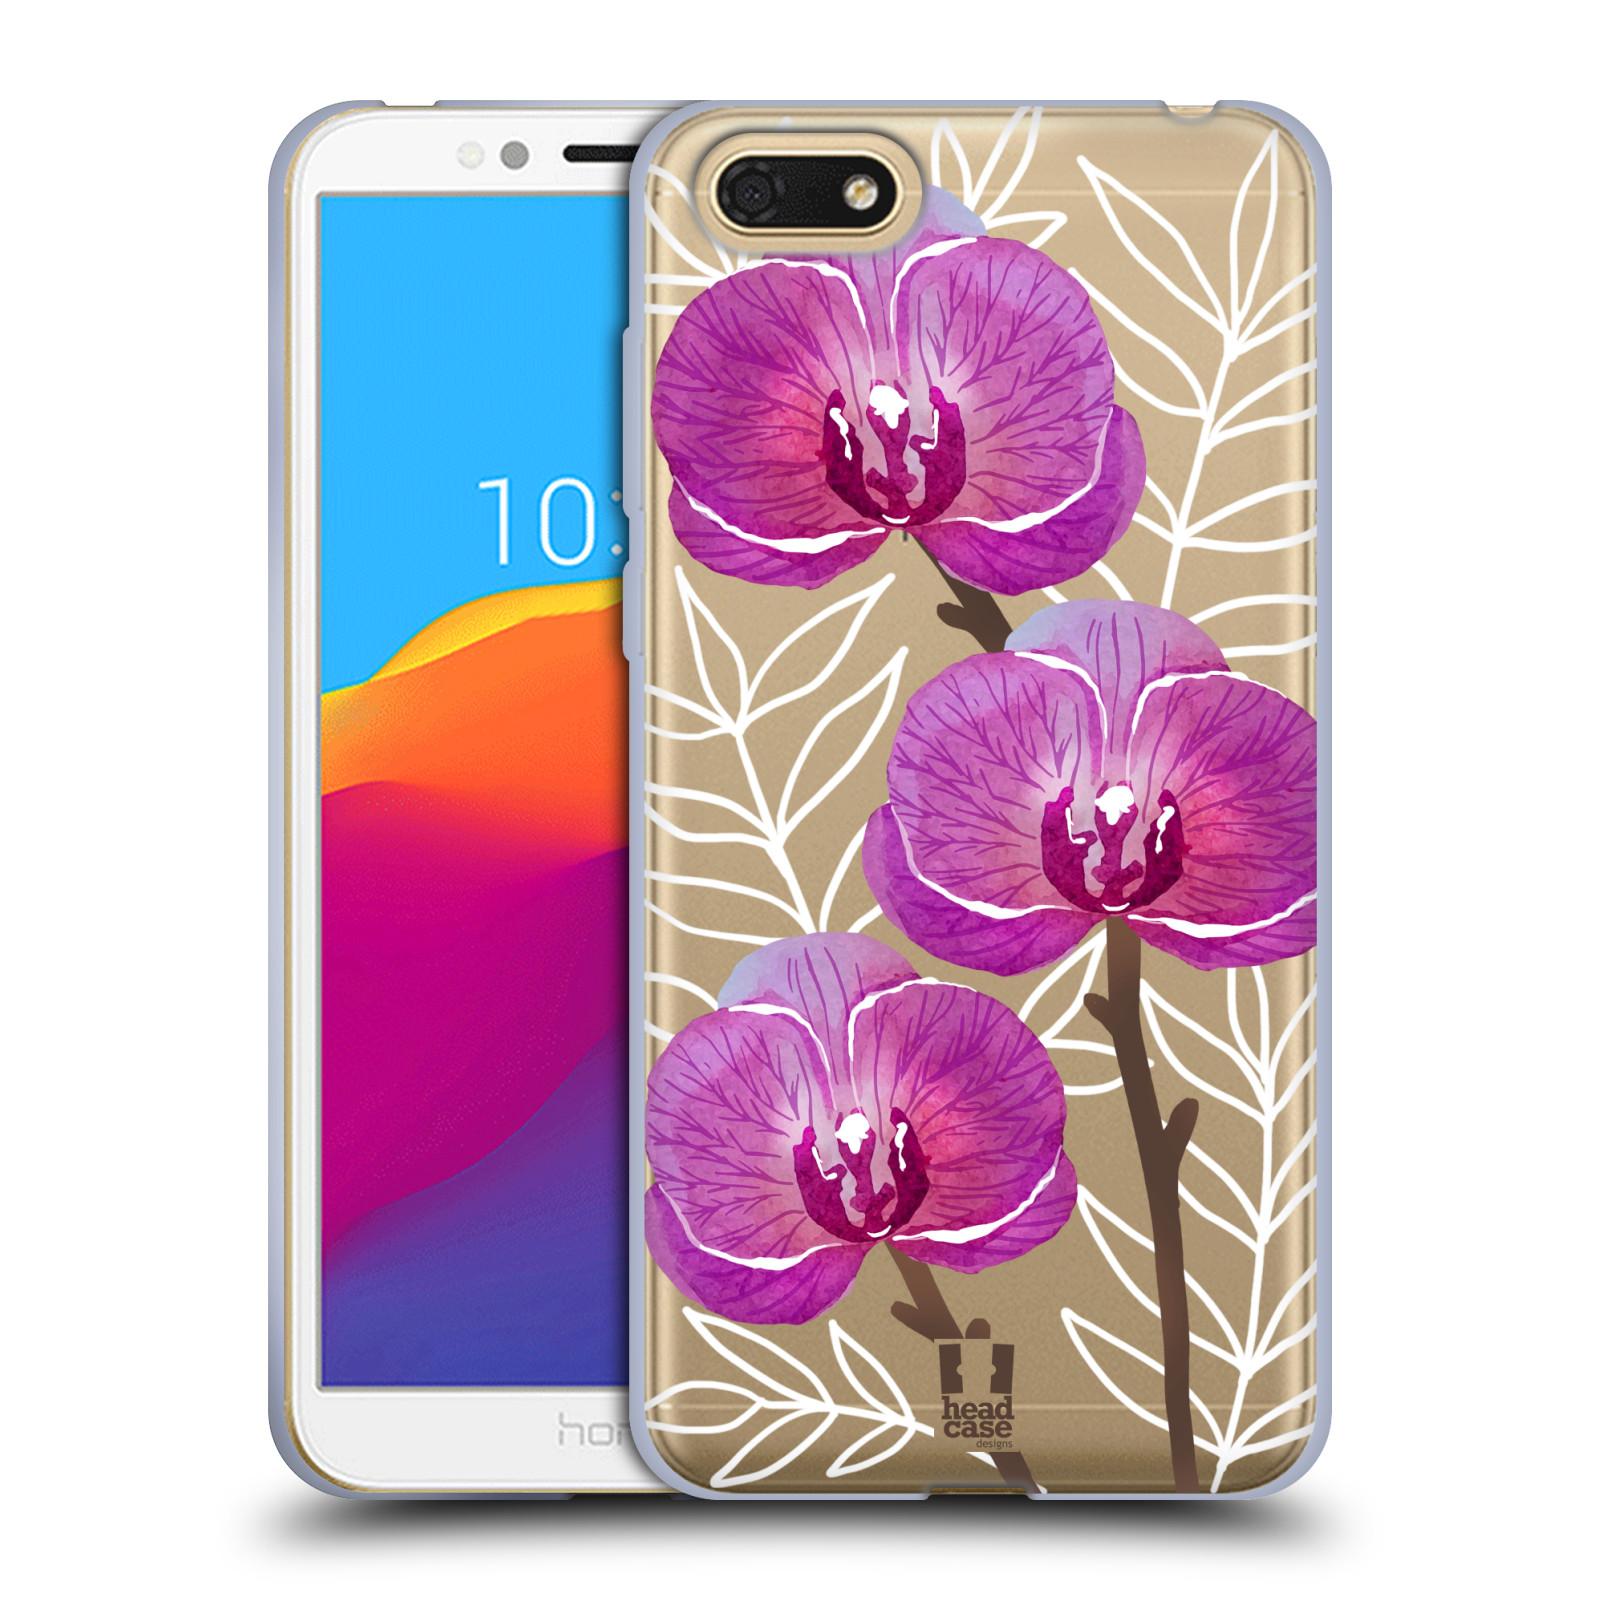 Silikonové pouzdro na mobil Huawei Y5 2018 - Head Case - Hezoučké kvítky - průhledné